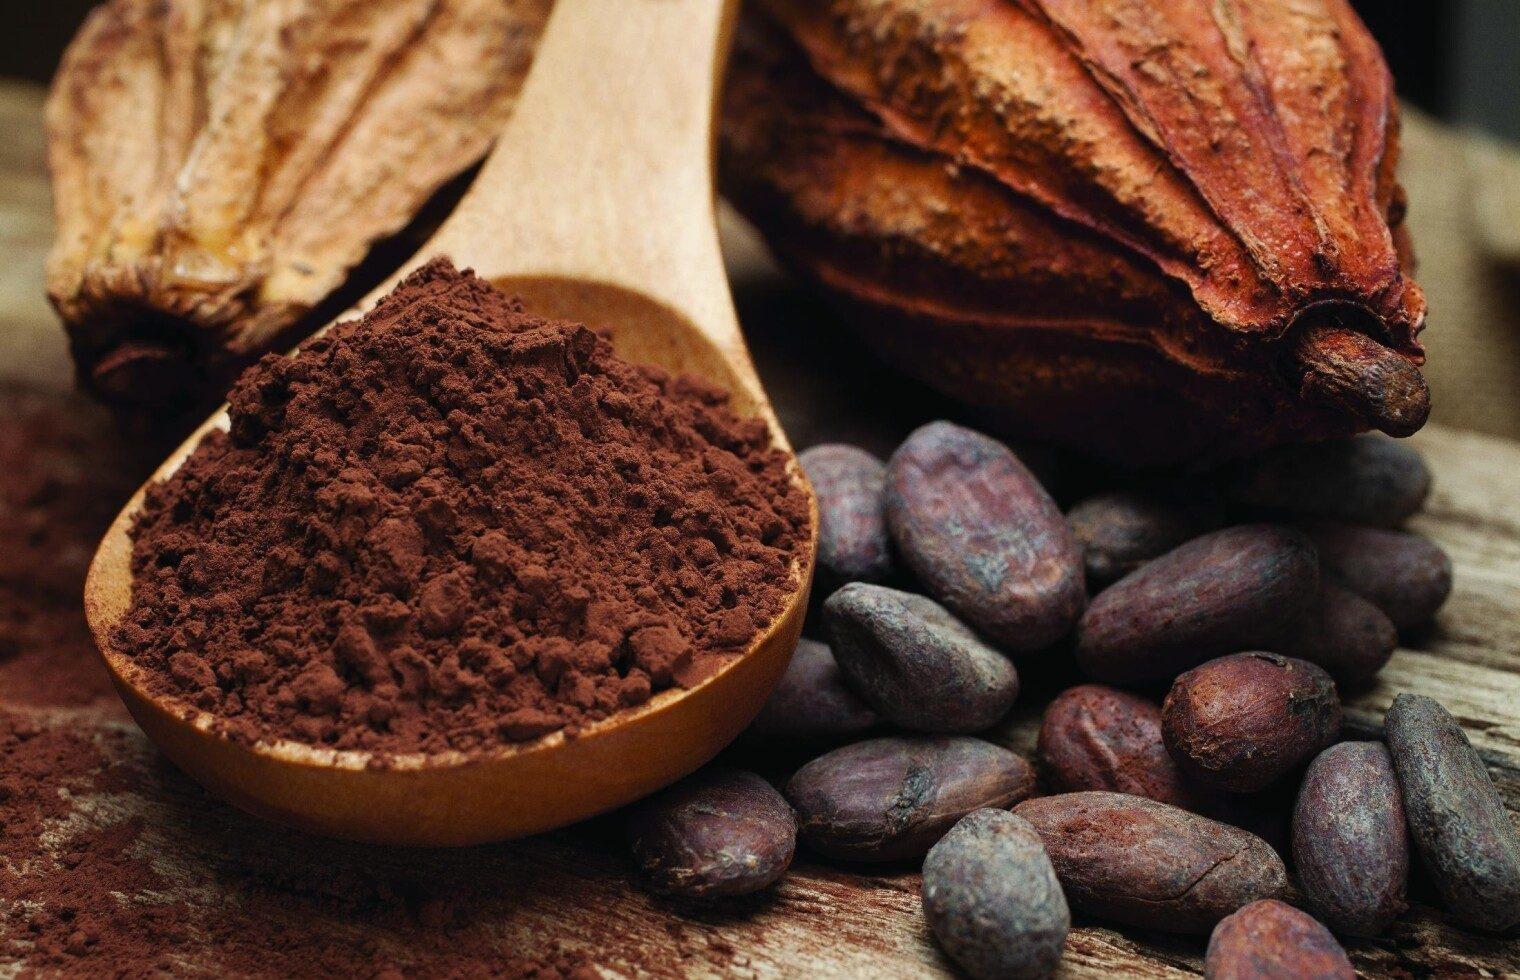 Фото натуральное какао.